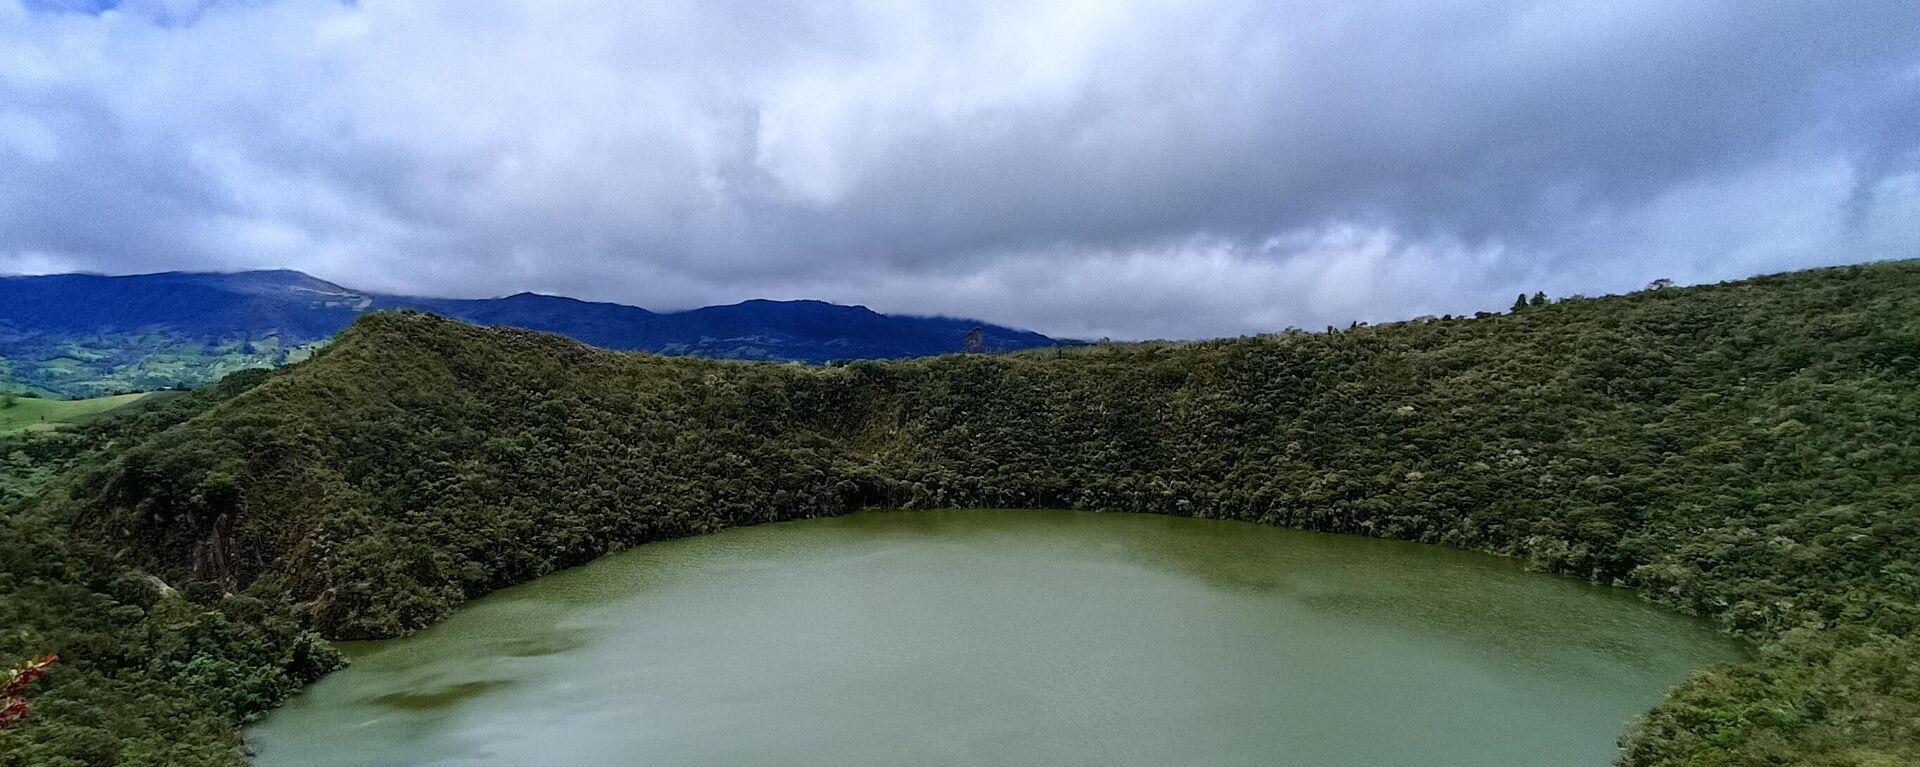 Laguna de Guatavita en el municipio de Sesquilé, Cundinamarca - Sputnik Mundo, 1920, 06.10.2021